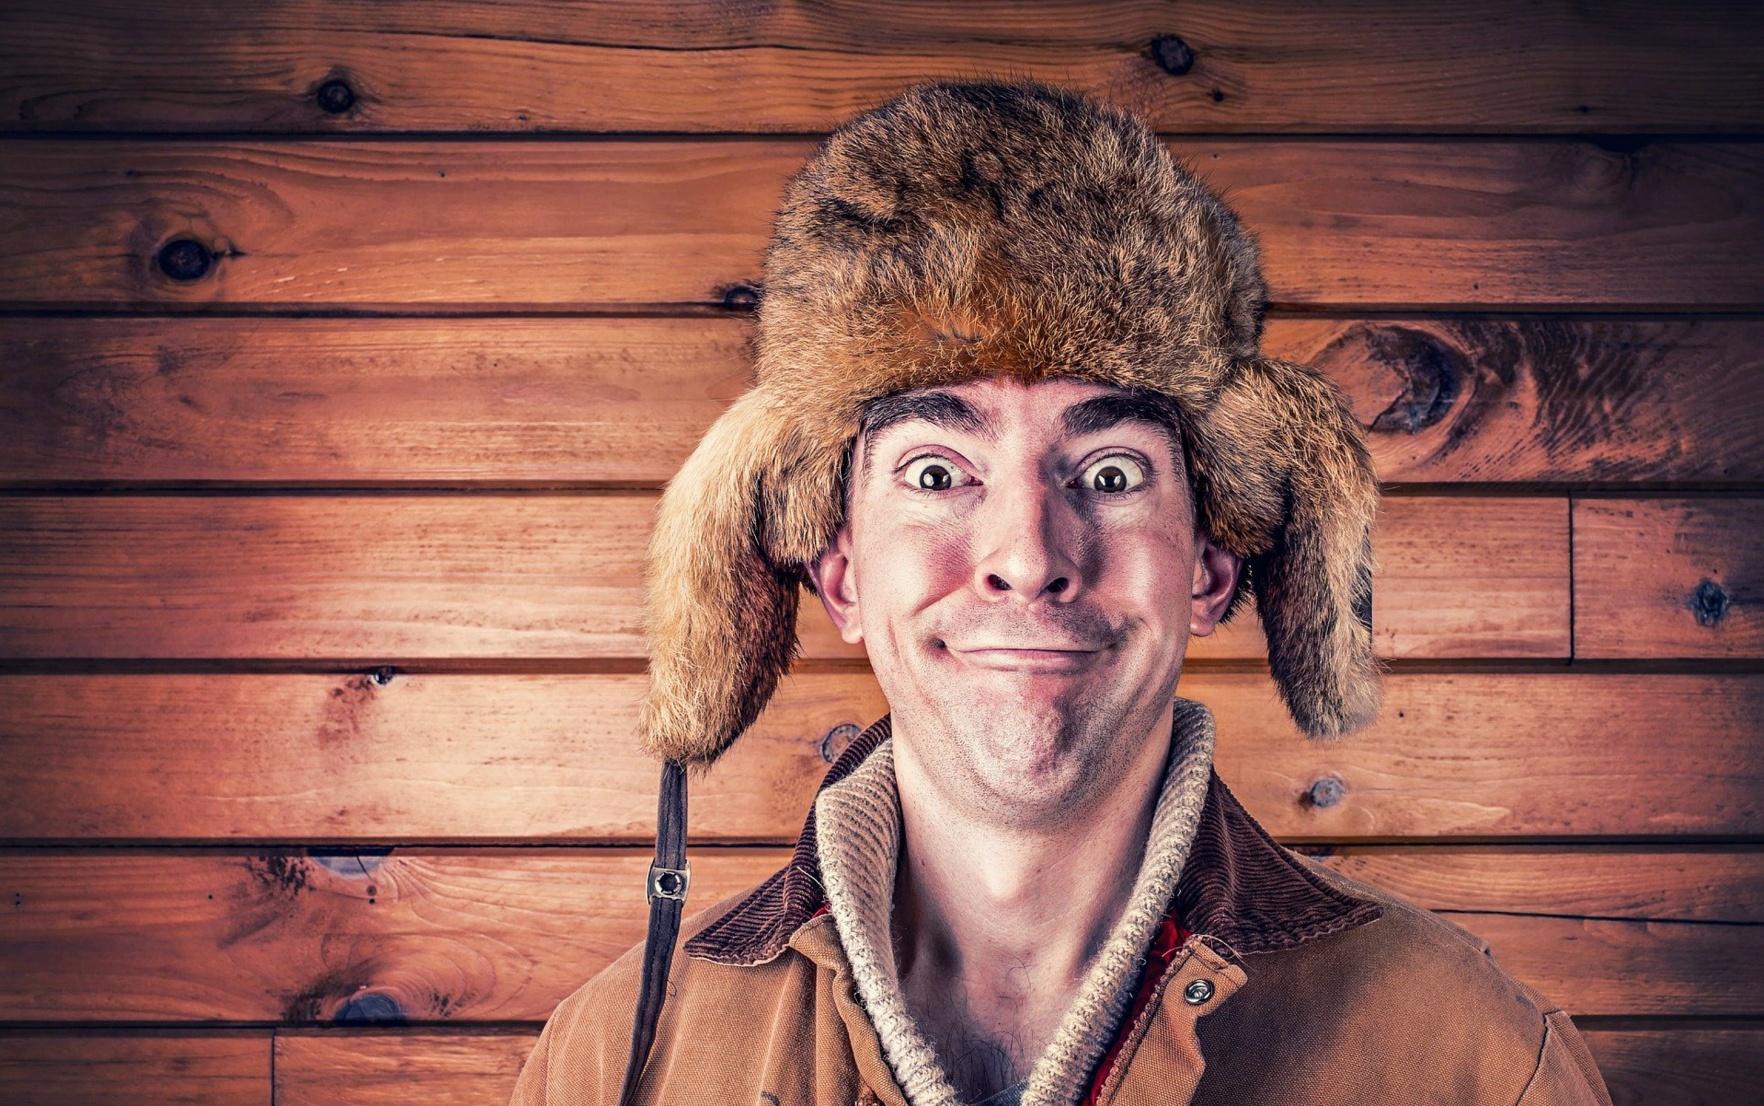 A man wearing a traditional Russian ushanka hat